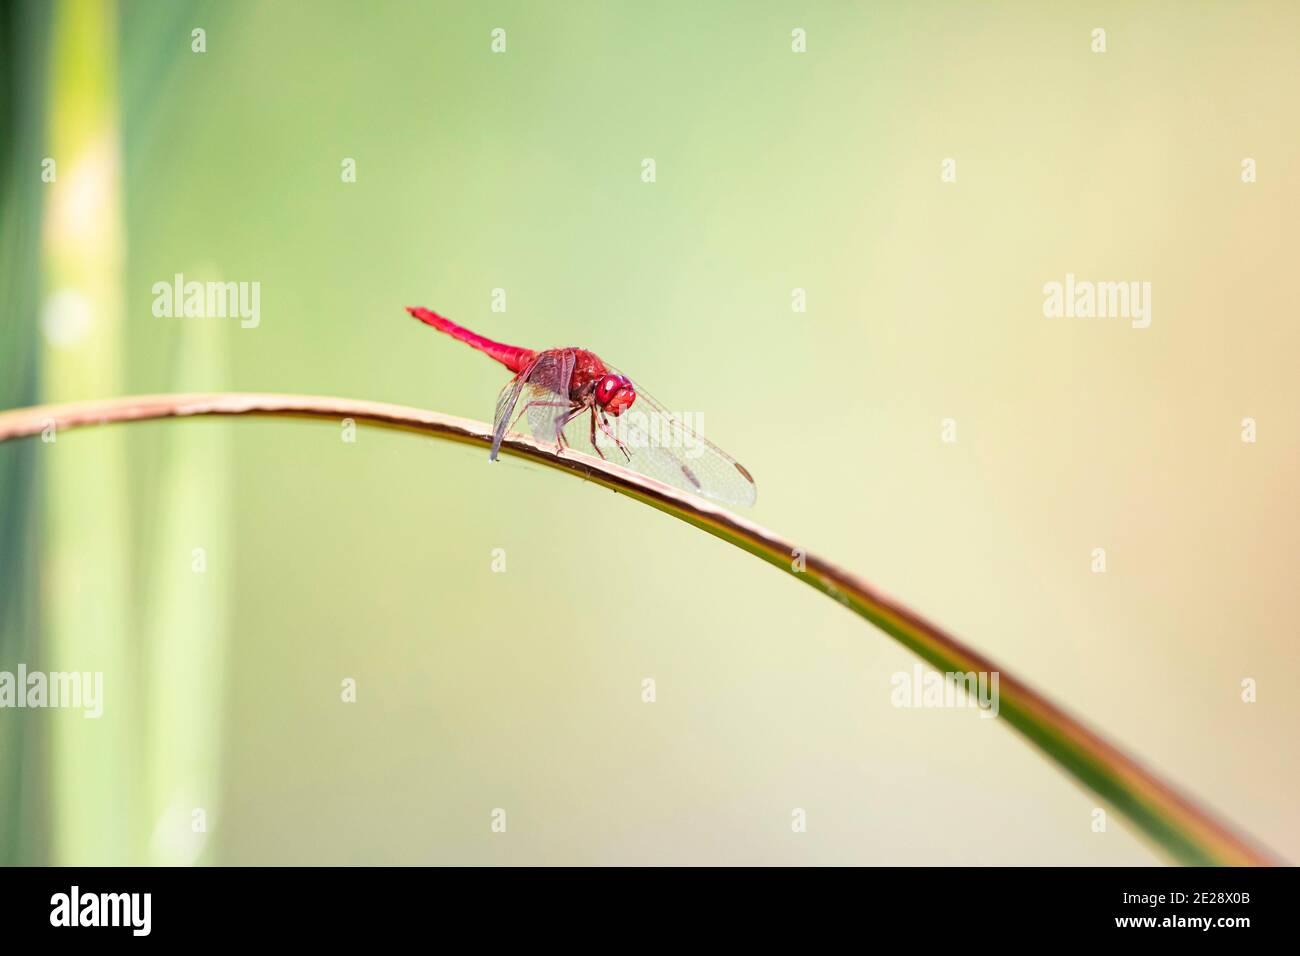 Broad Scarlet, Common Scarlet-darter, Scarlet Darter, Scarlet Dragonfly (Crocothemis erythraea, Croccothemis erythraea), male sits on a leaf, Germany, Stock Photo